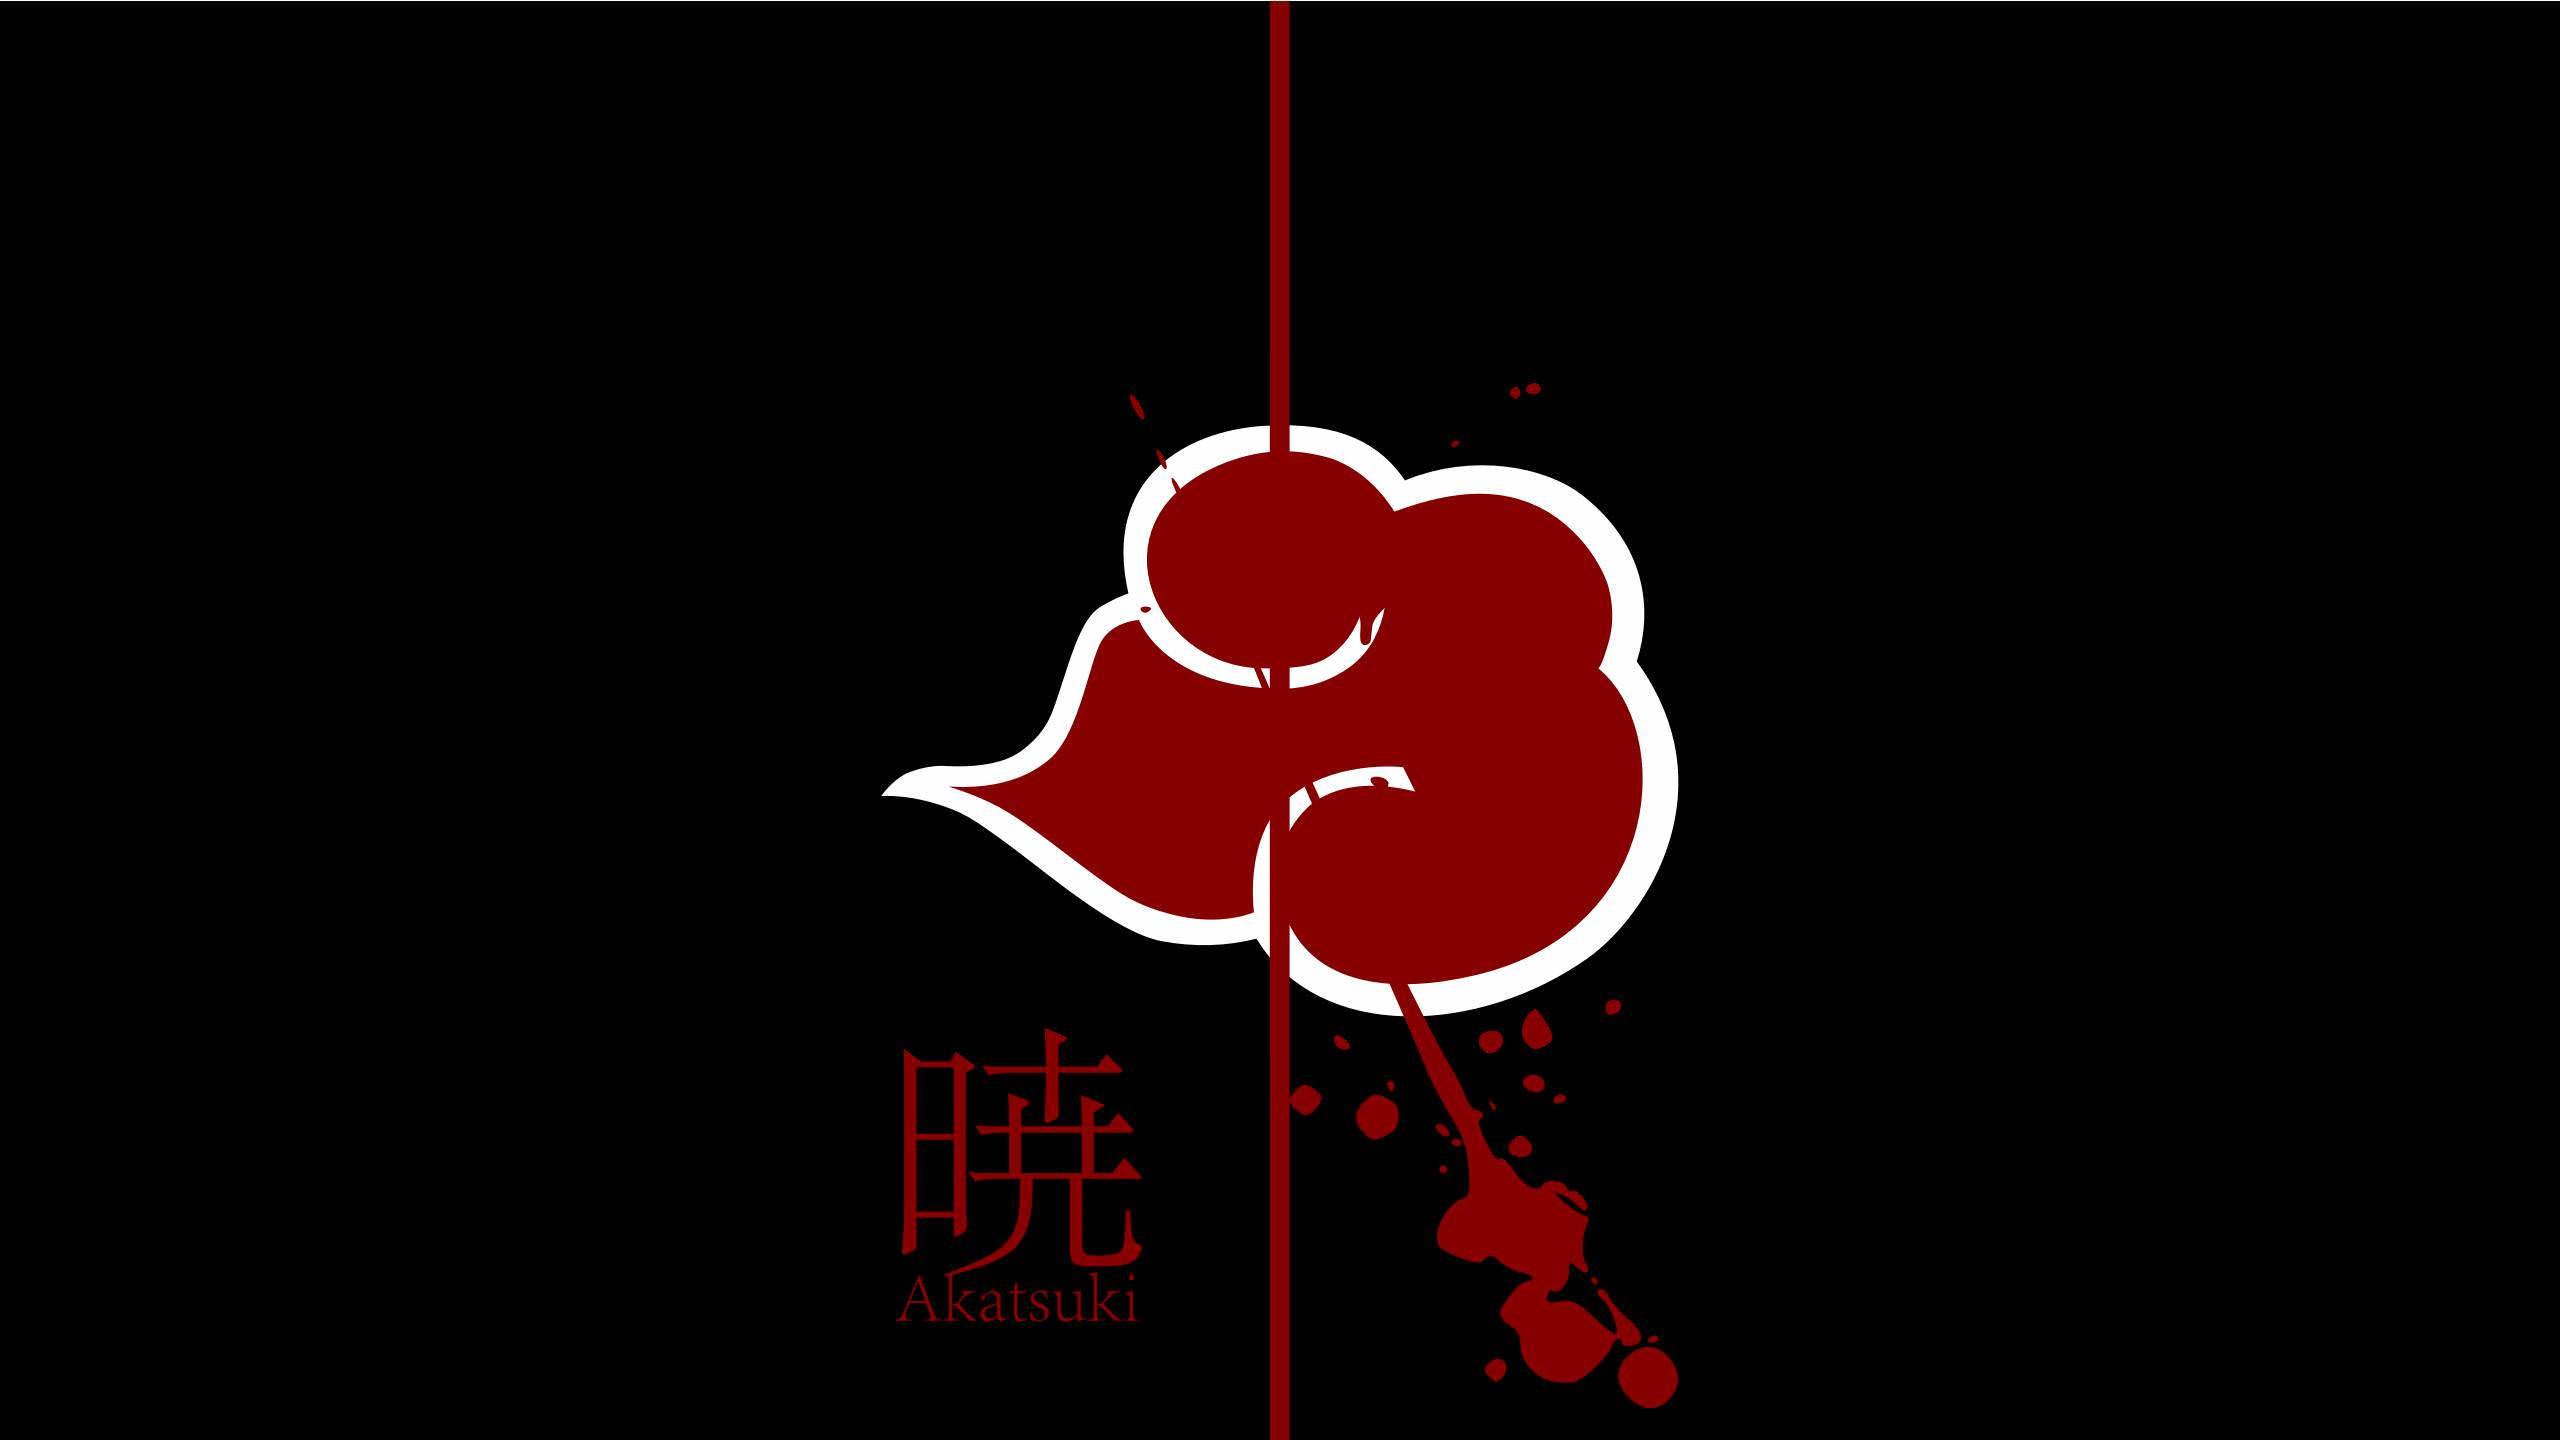 832179 konoha logo wallpaper 2560x1440 for lockscreen